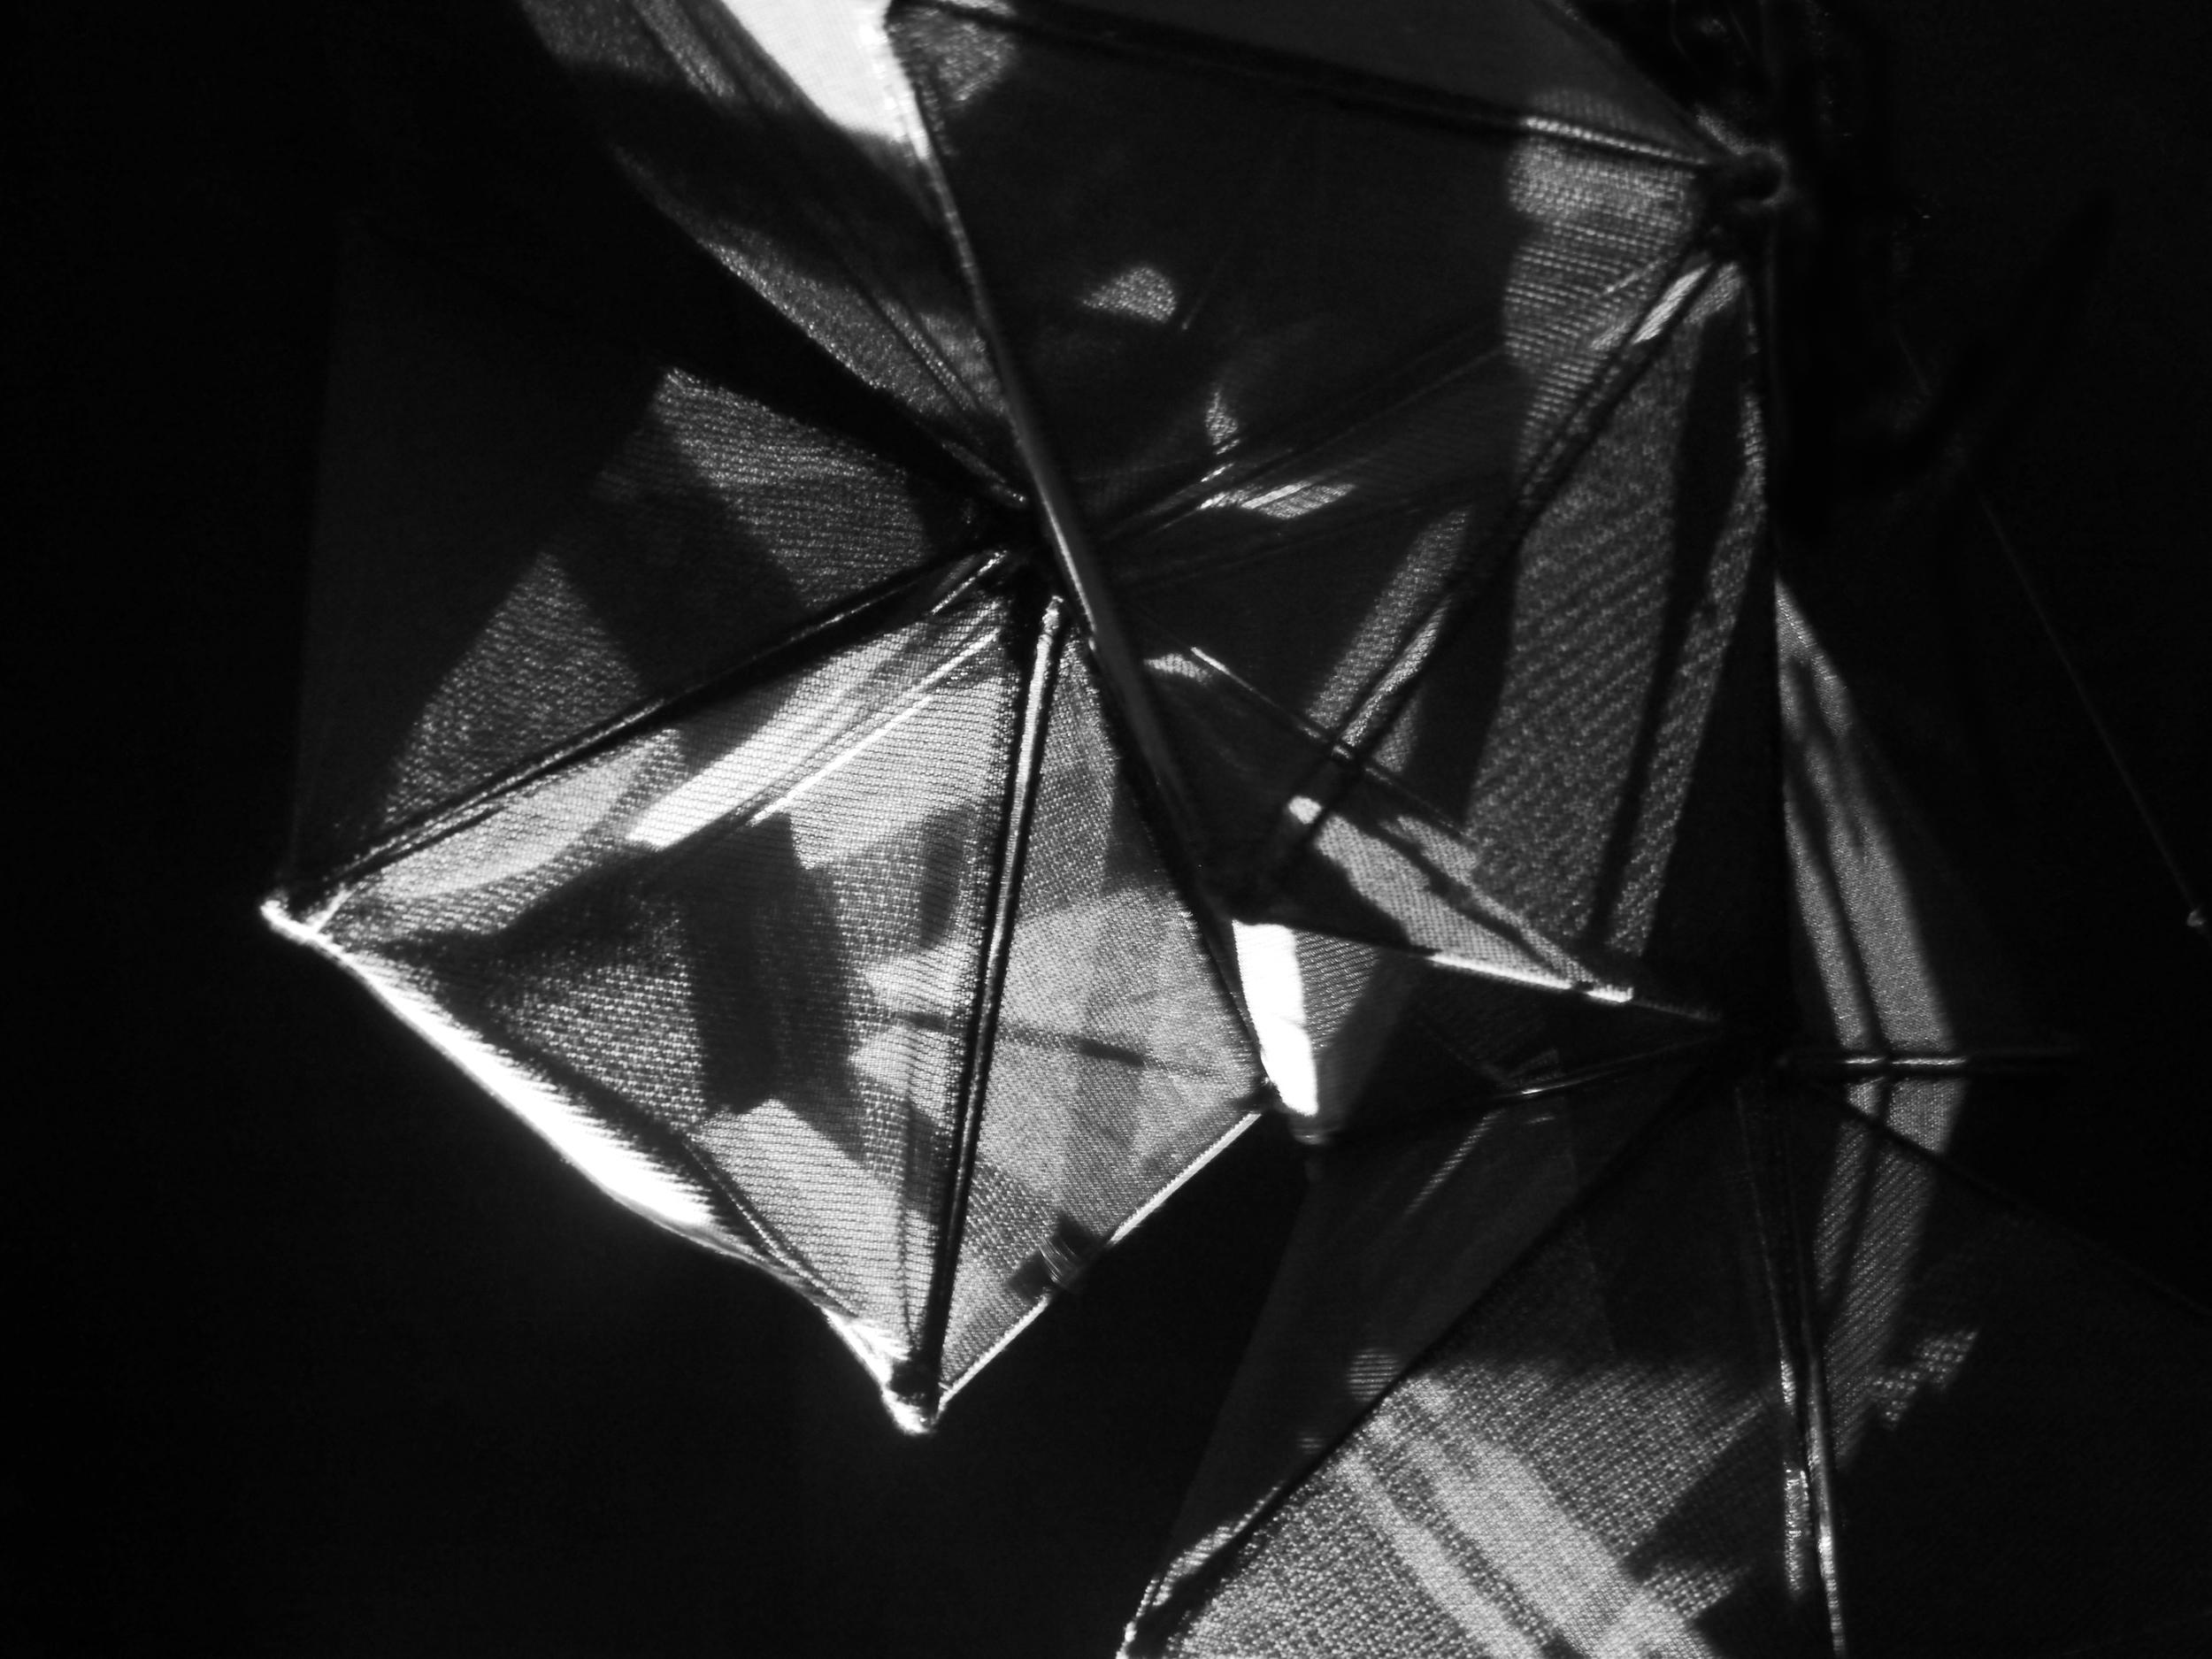 projective distortion close up 300dpi.jpg